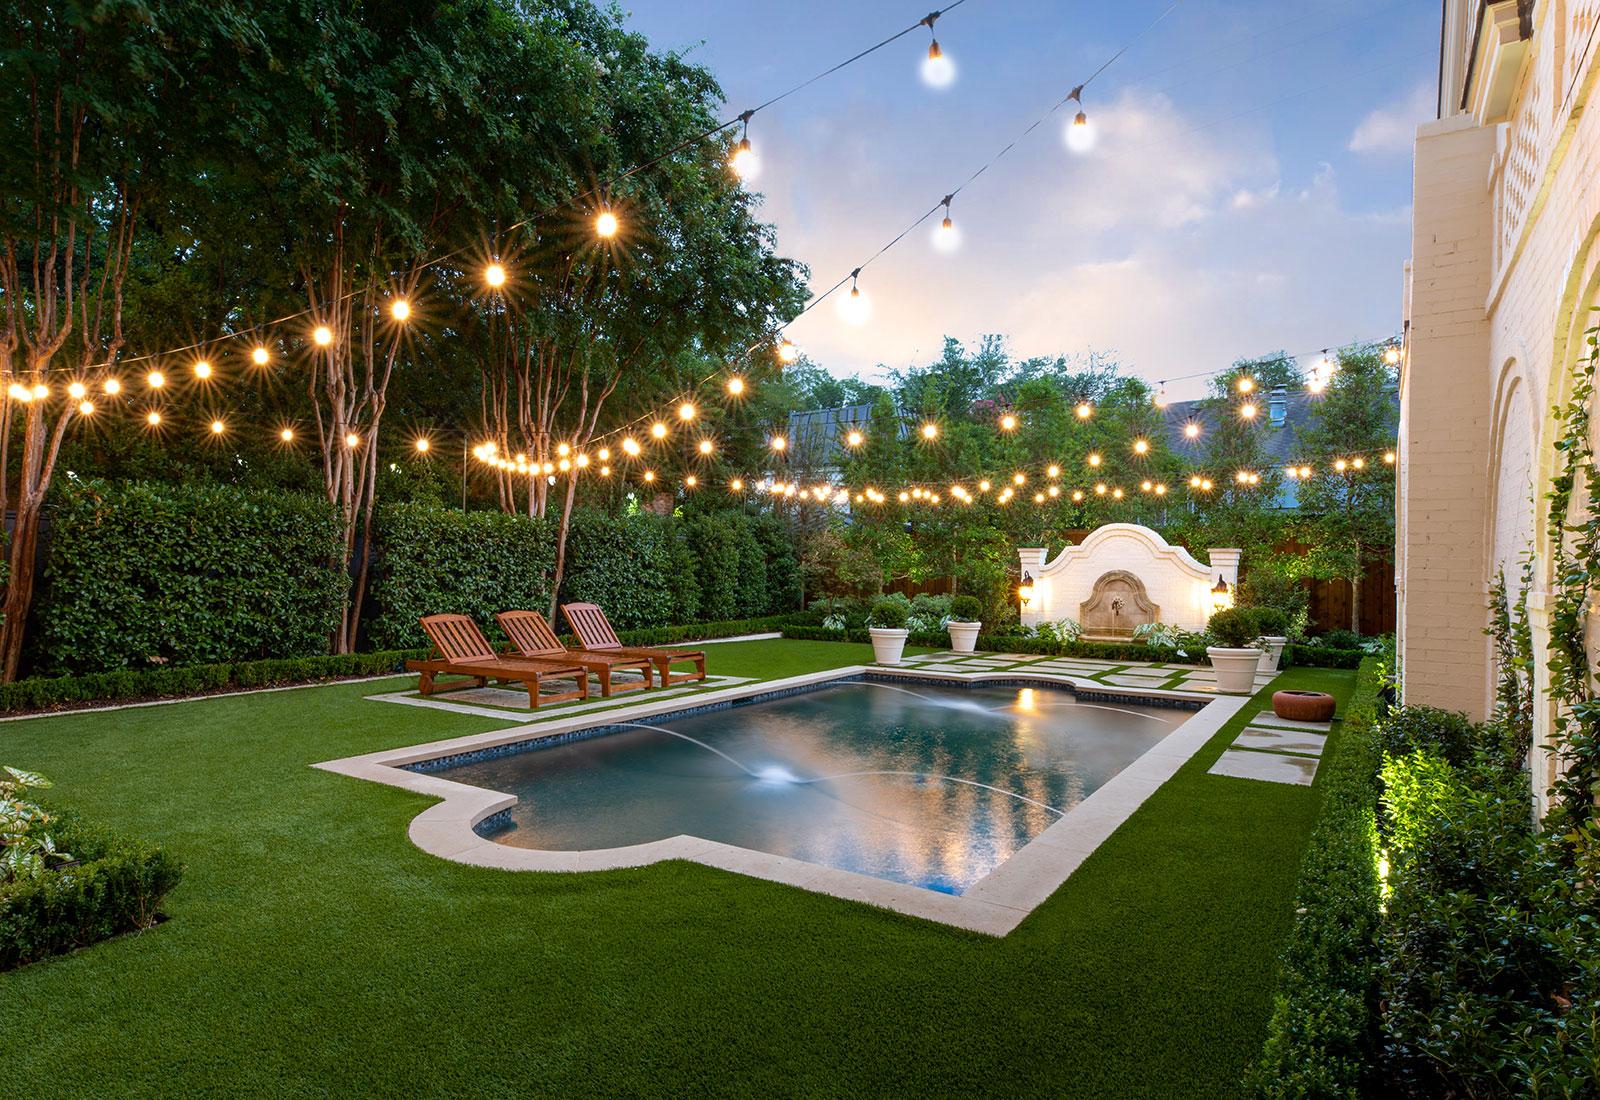 ddla-design-windsor-pool-garden-evening3.jpg